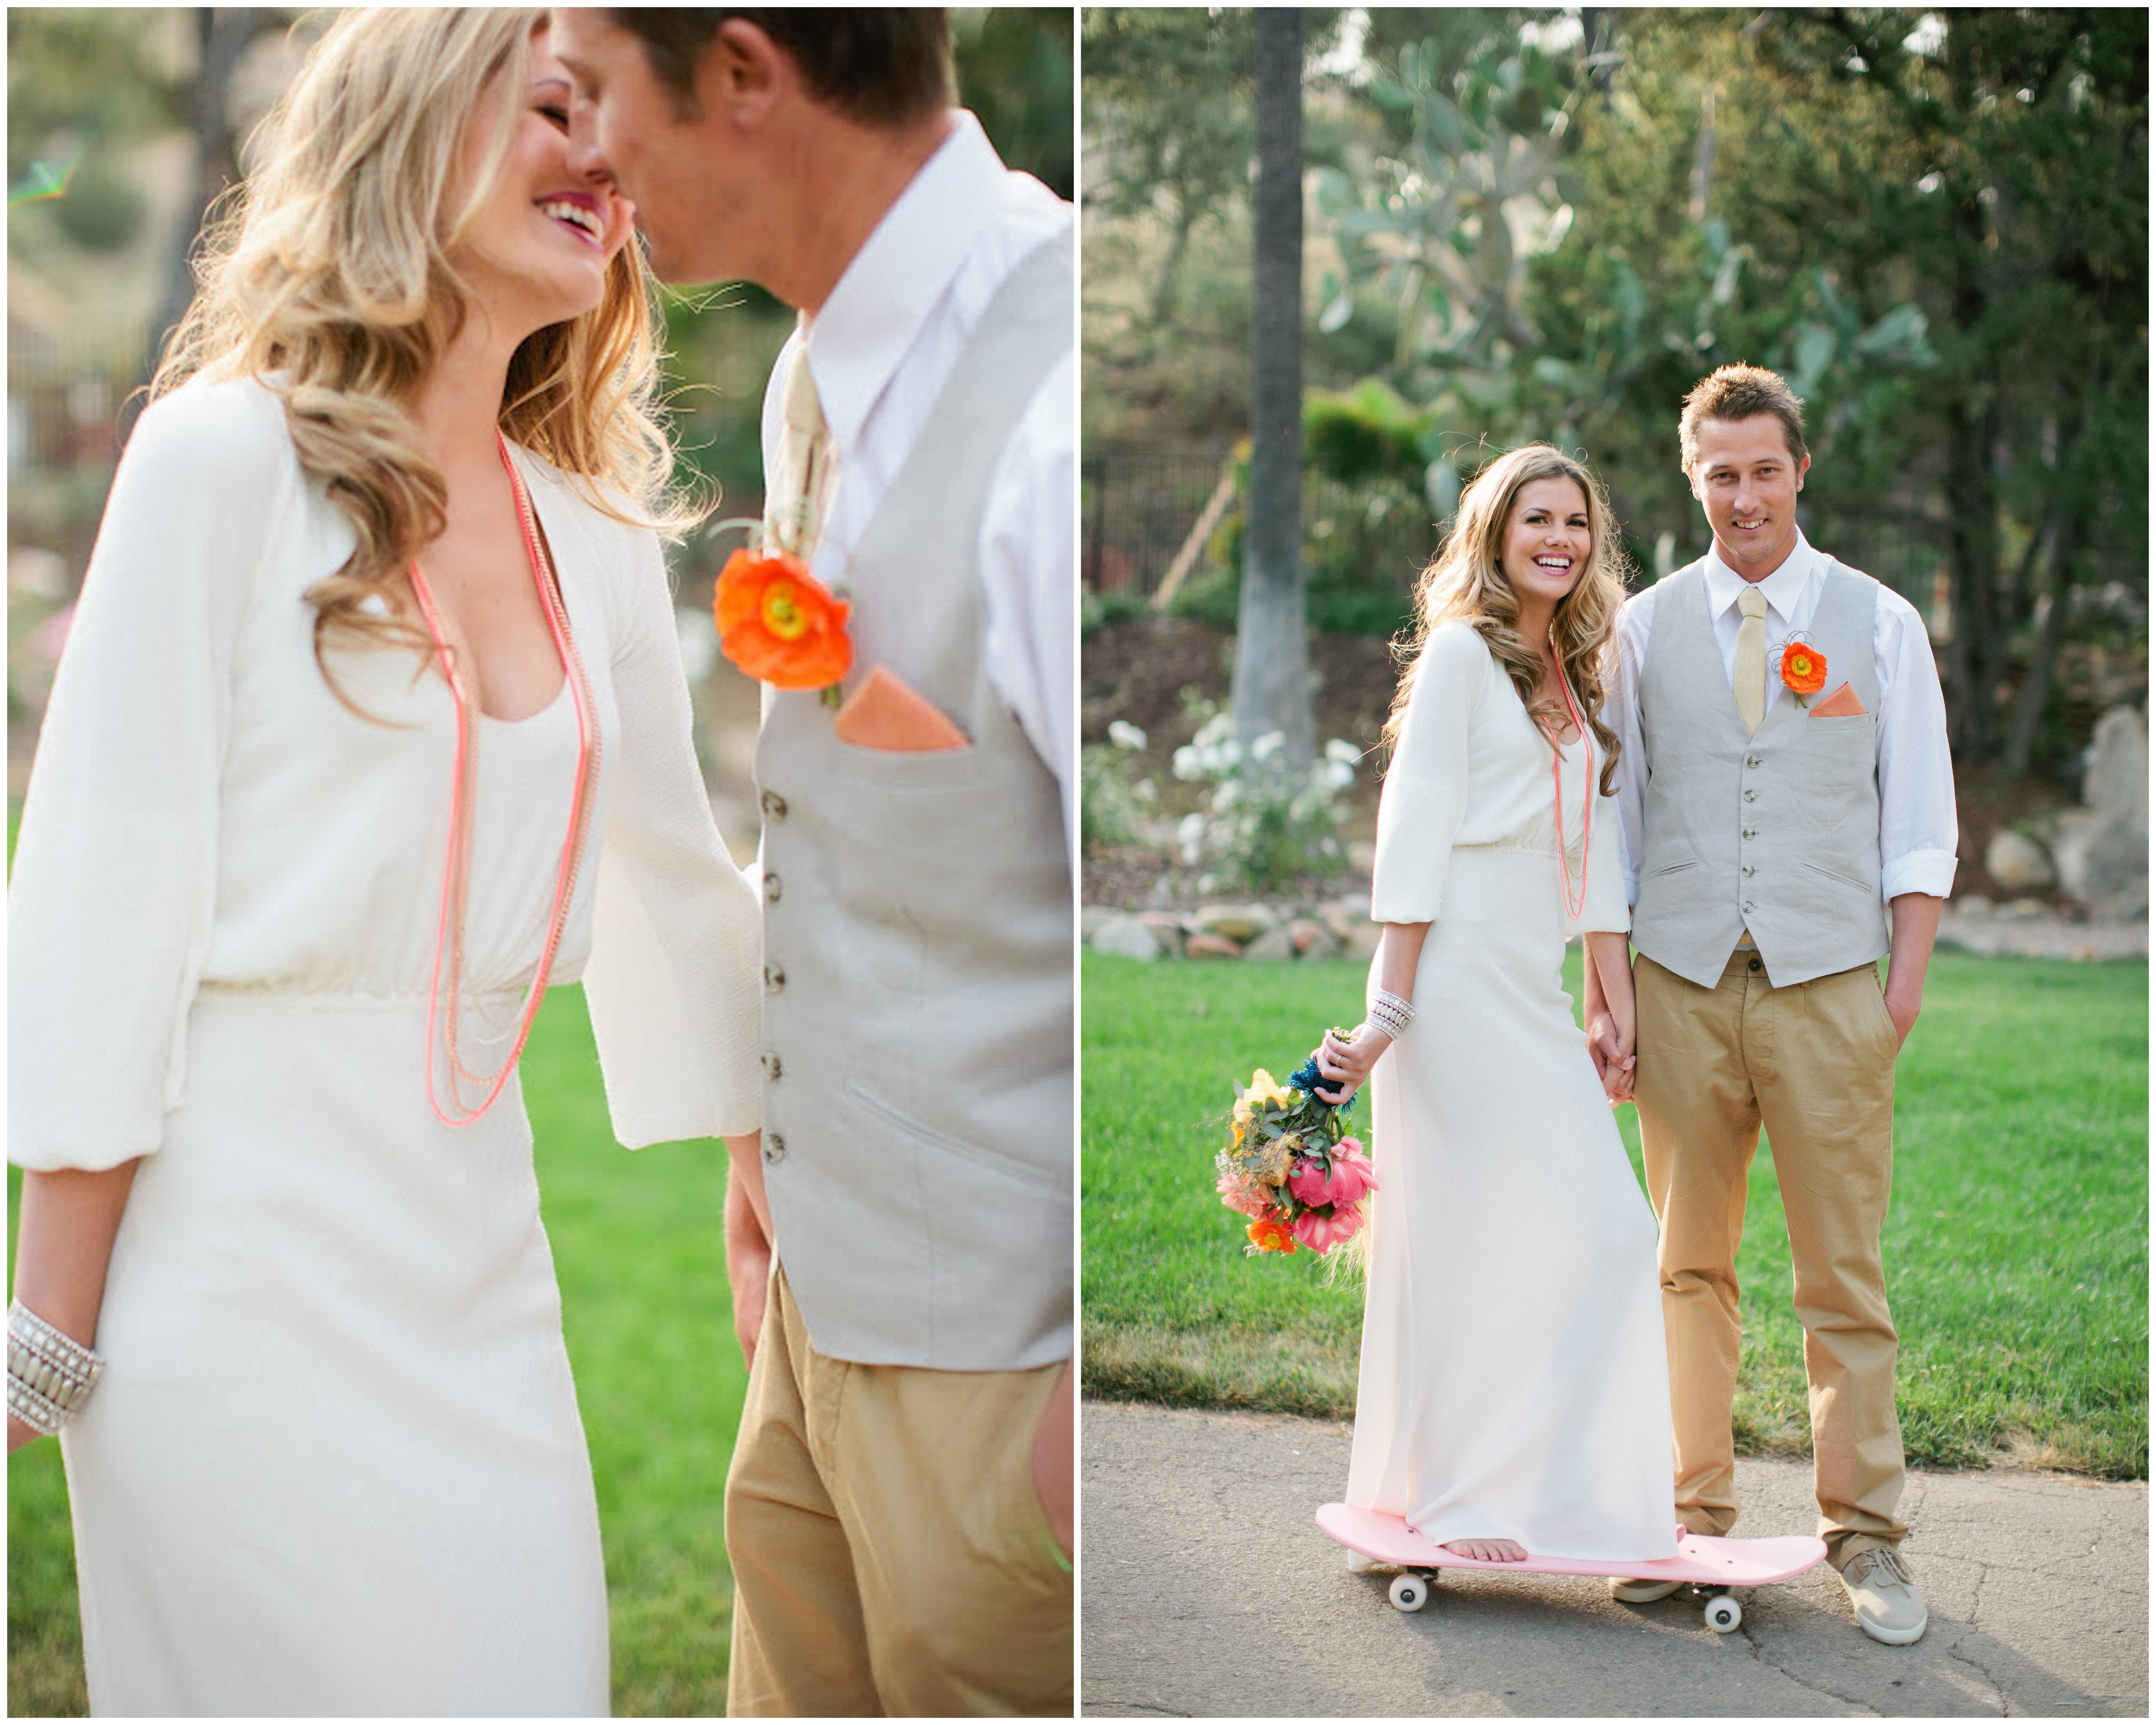 Stone Cold Fox Wedding Dress | beauandarrowevents